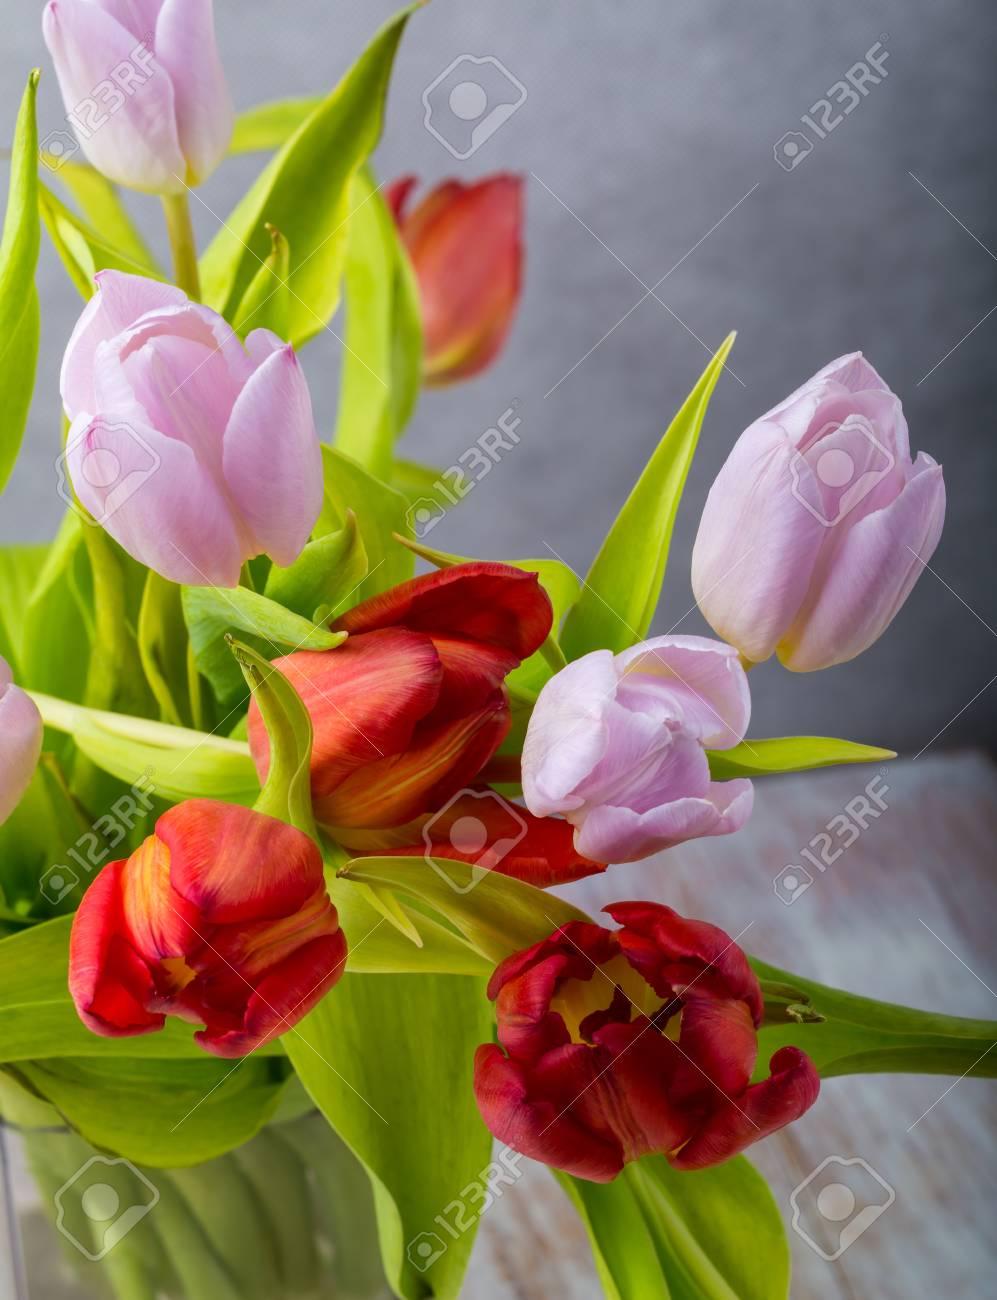 Studio Photo Of Tulips Beautiful Tulips Flowers Close Up Stock